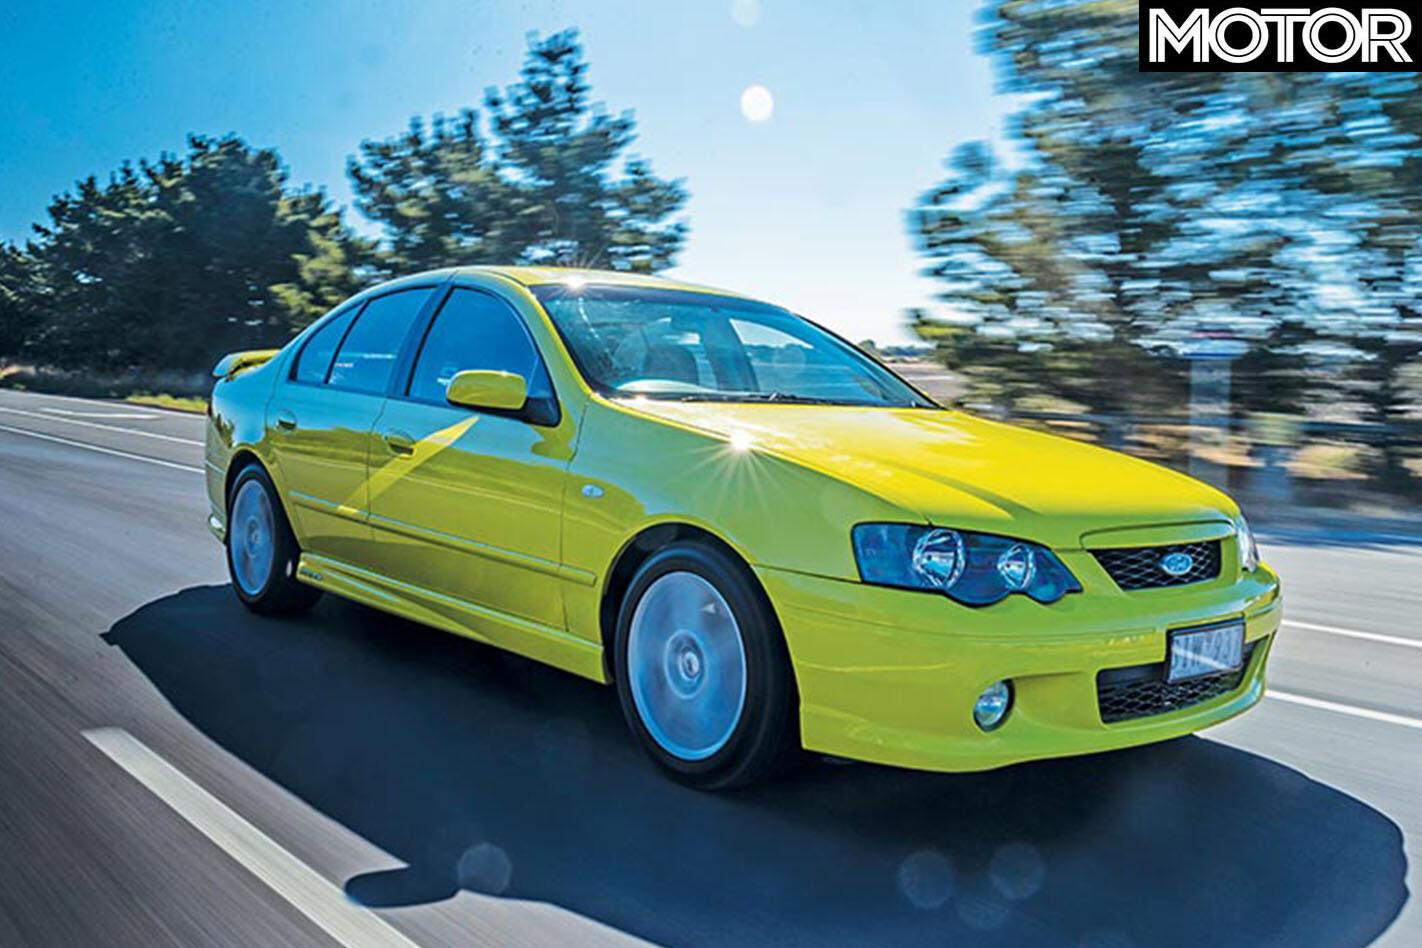 Xr 6 Turbo Jpg